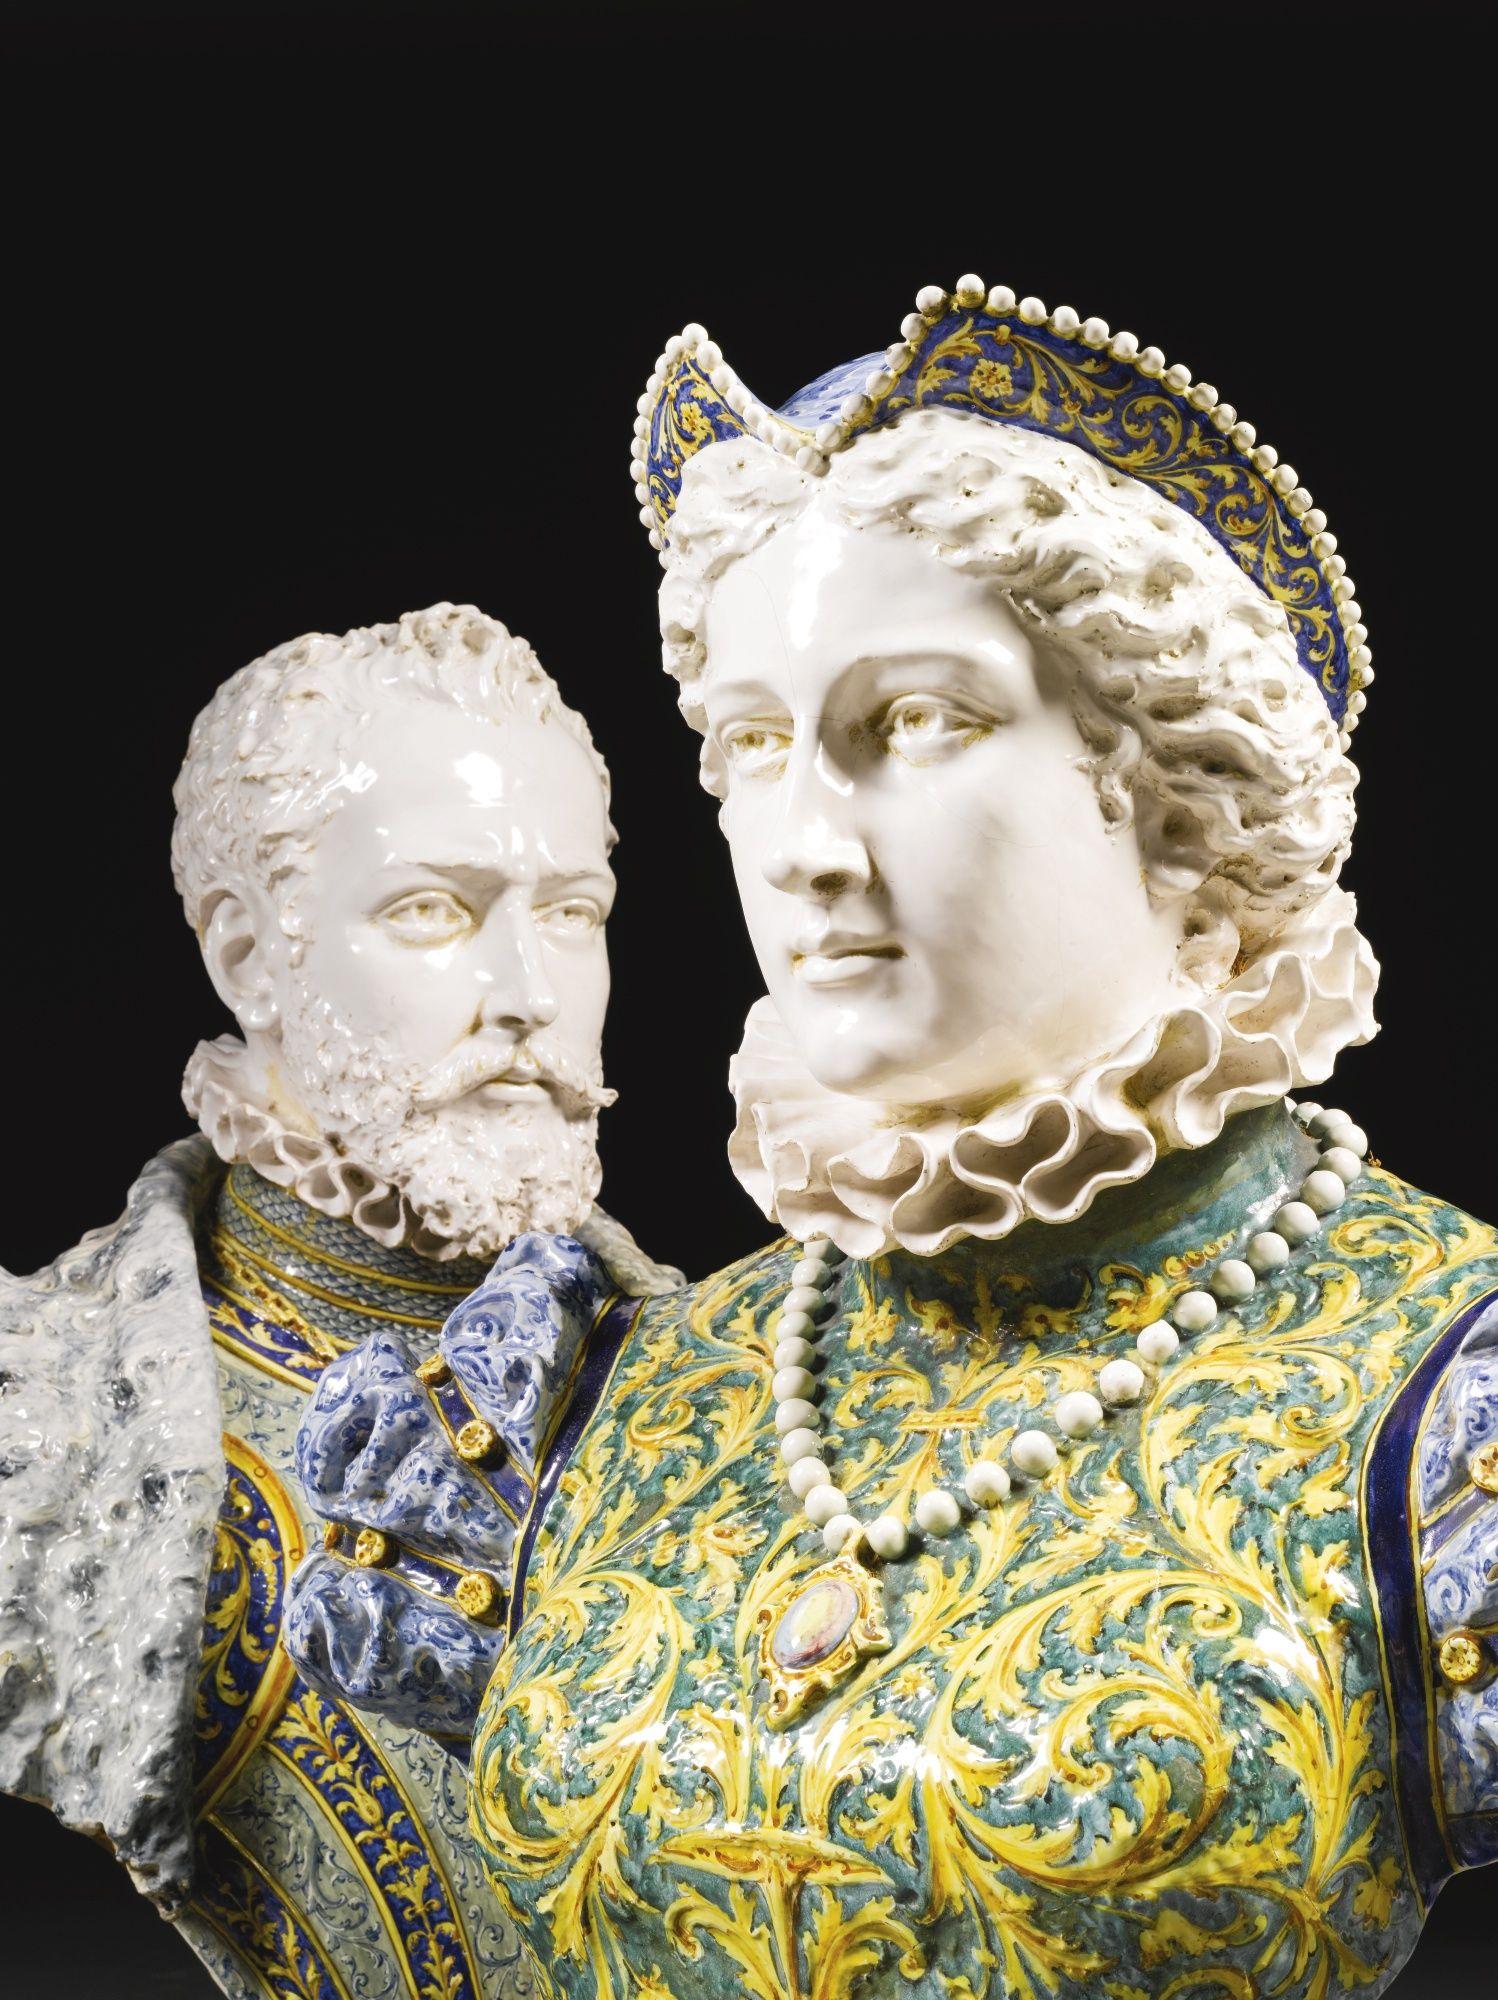 Angelo Minghetti Manufactoryitalian Bologna 19th Early 20th Century Lot European Sculpture Statue Art Exhibition